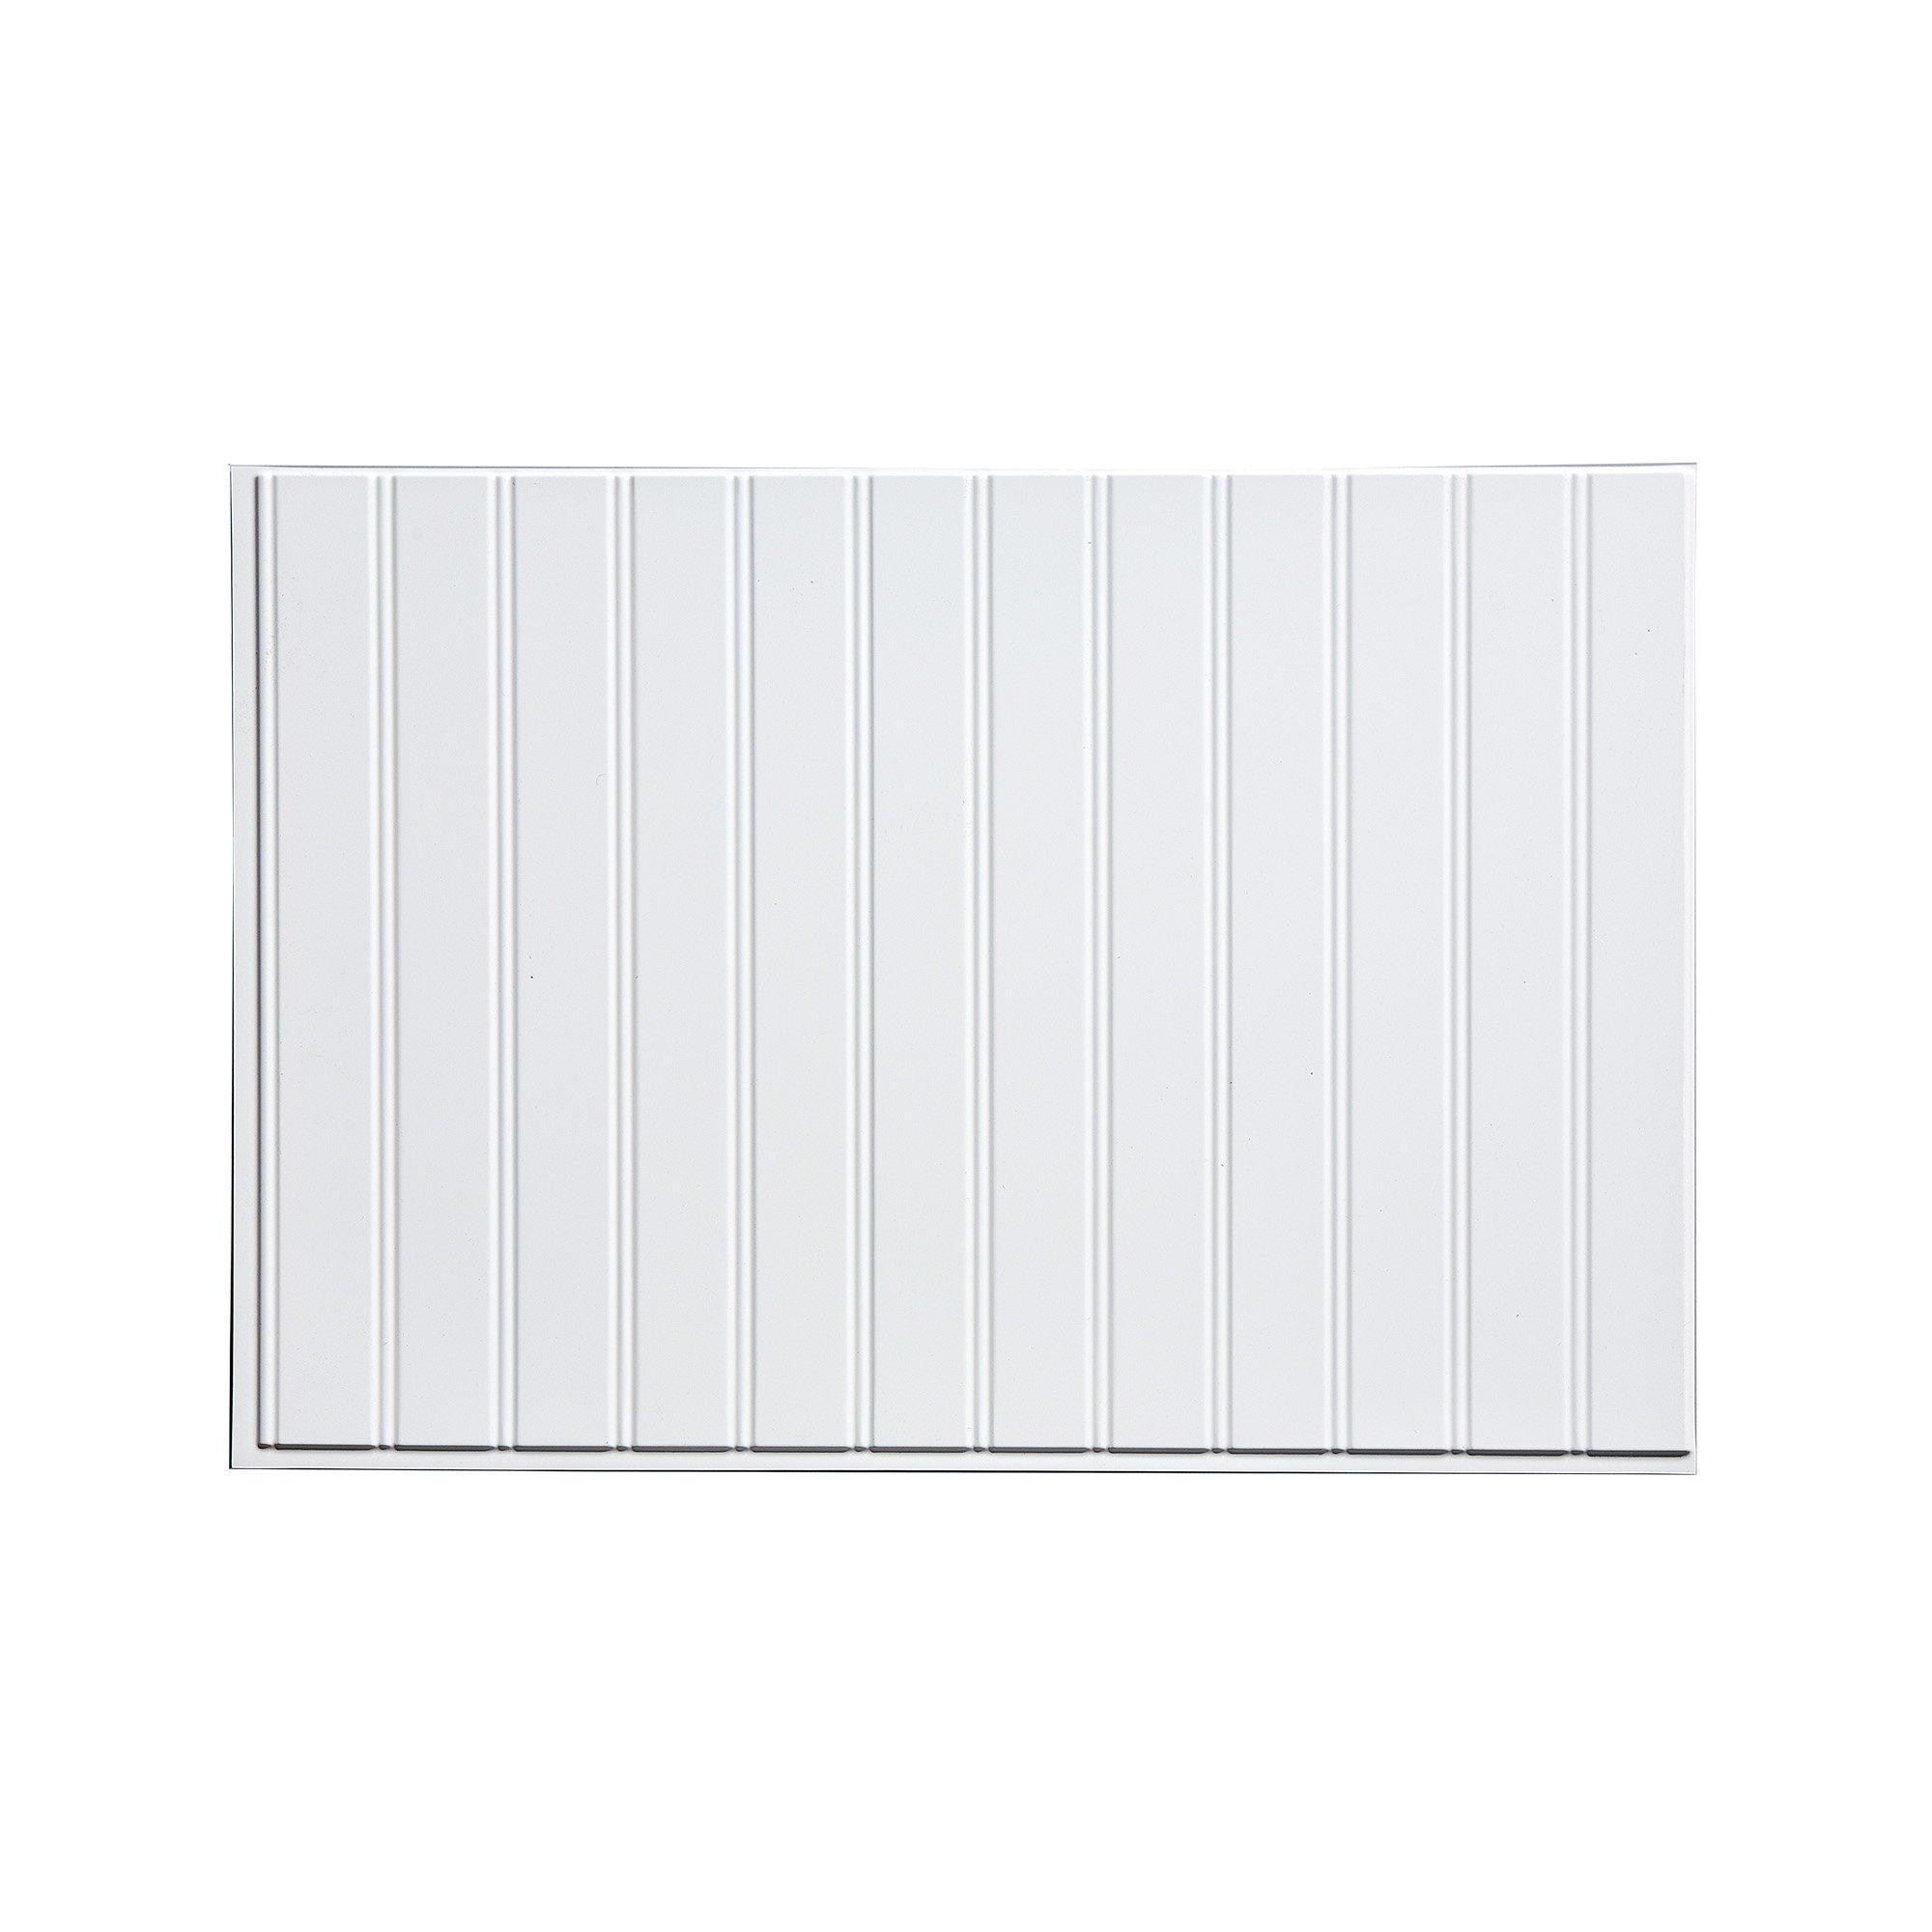 Fasade Easy Installation Bead Board Gloss White Decorative Vinyl Backsplash Panel (18'' x 24'' Panel)